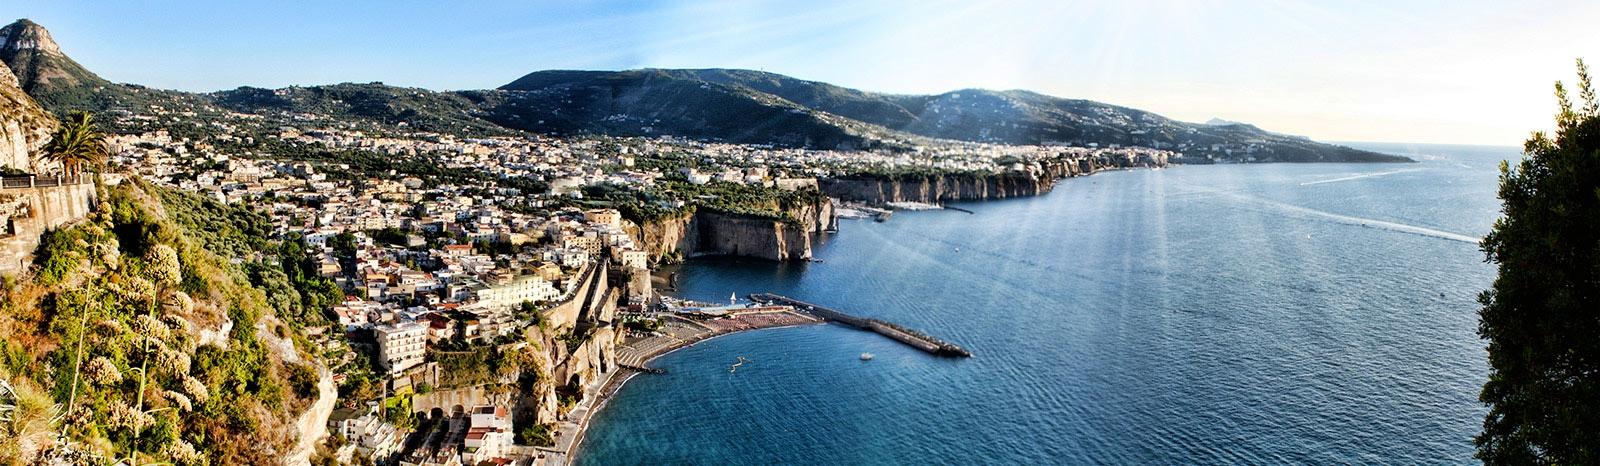 Zoom Car Rental >> The Town of Meta di Sorrento in Sorrento Coast - Holiday in Sorrento Peninsula